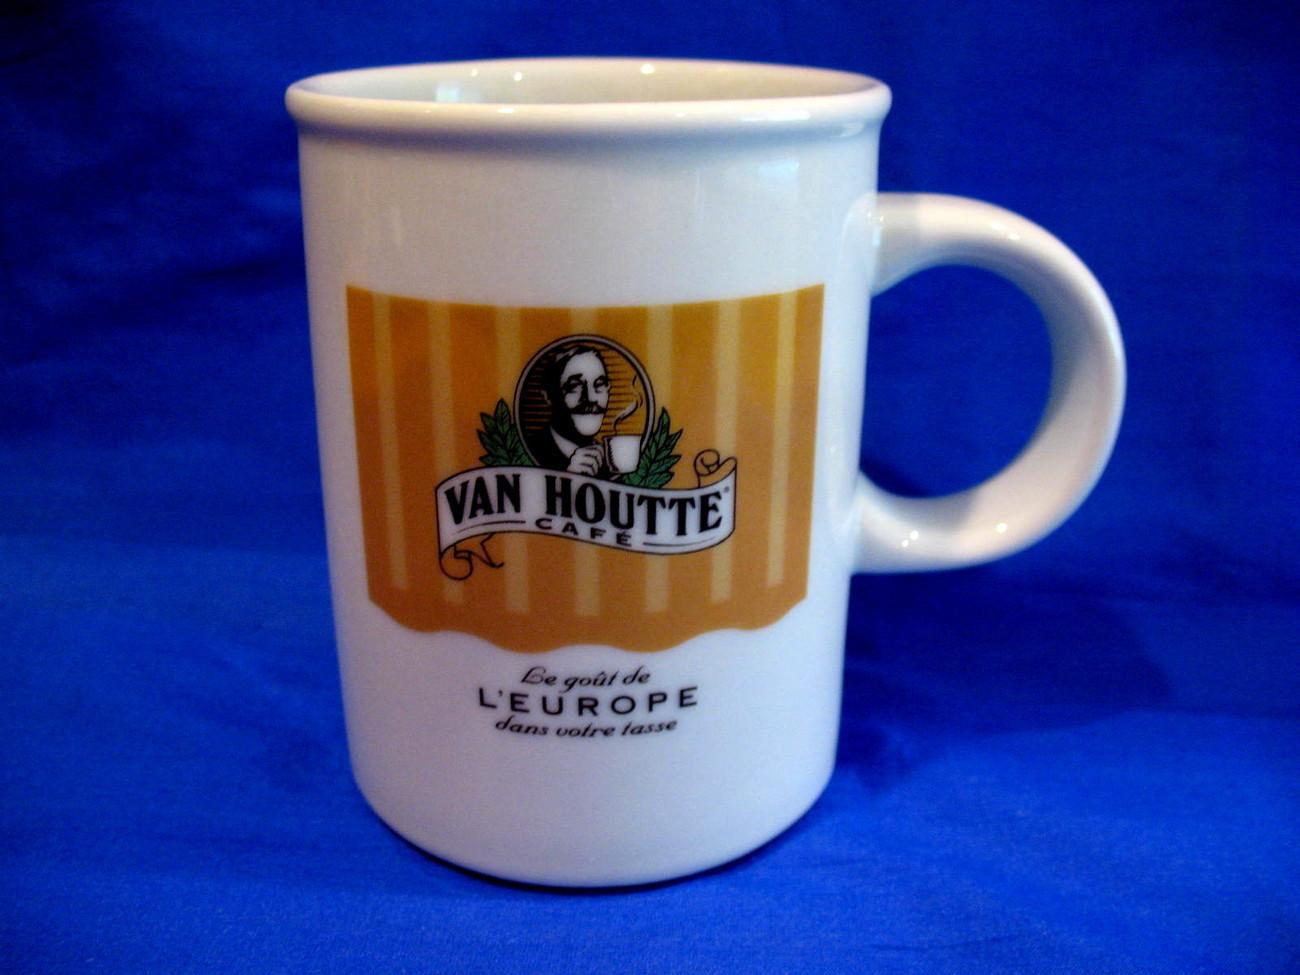 Van Houtte Cafe Coffee Mug Tea Cup A Taste of Europe Souvenir Collectible